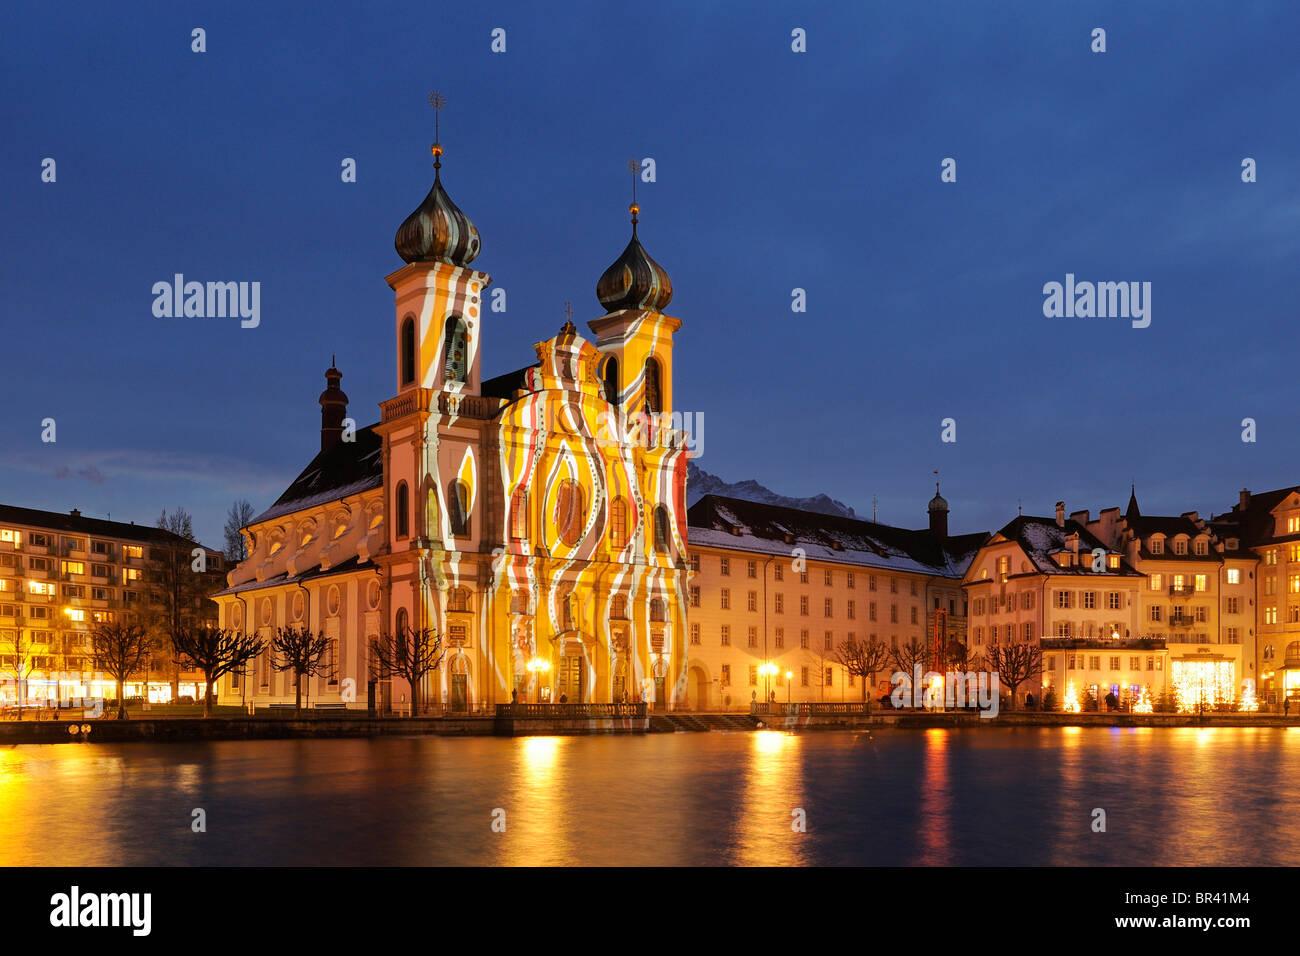 Jesuit Church illuminated by light artist Gerry Hofstetter with Christmas light, Lucerne, Switzerland, Europe - Stock Image